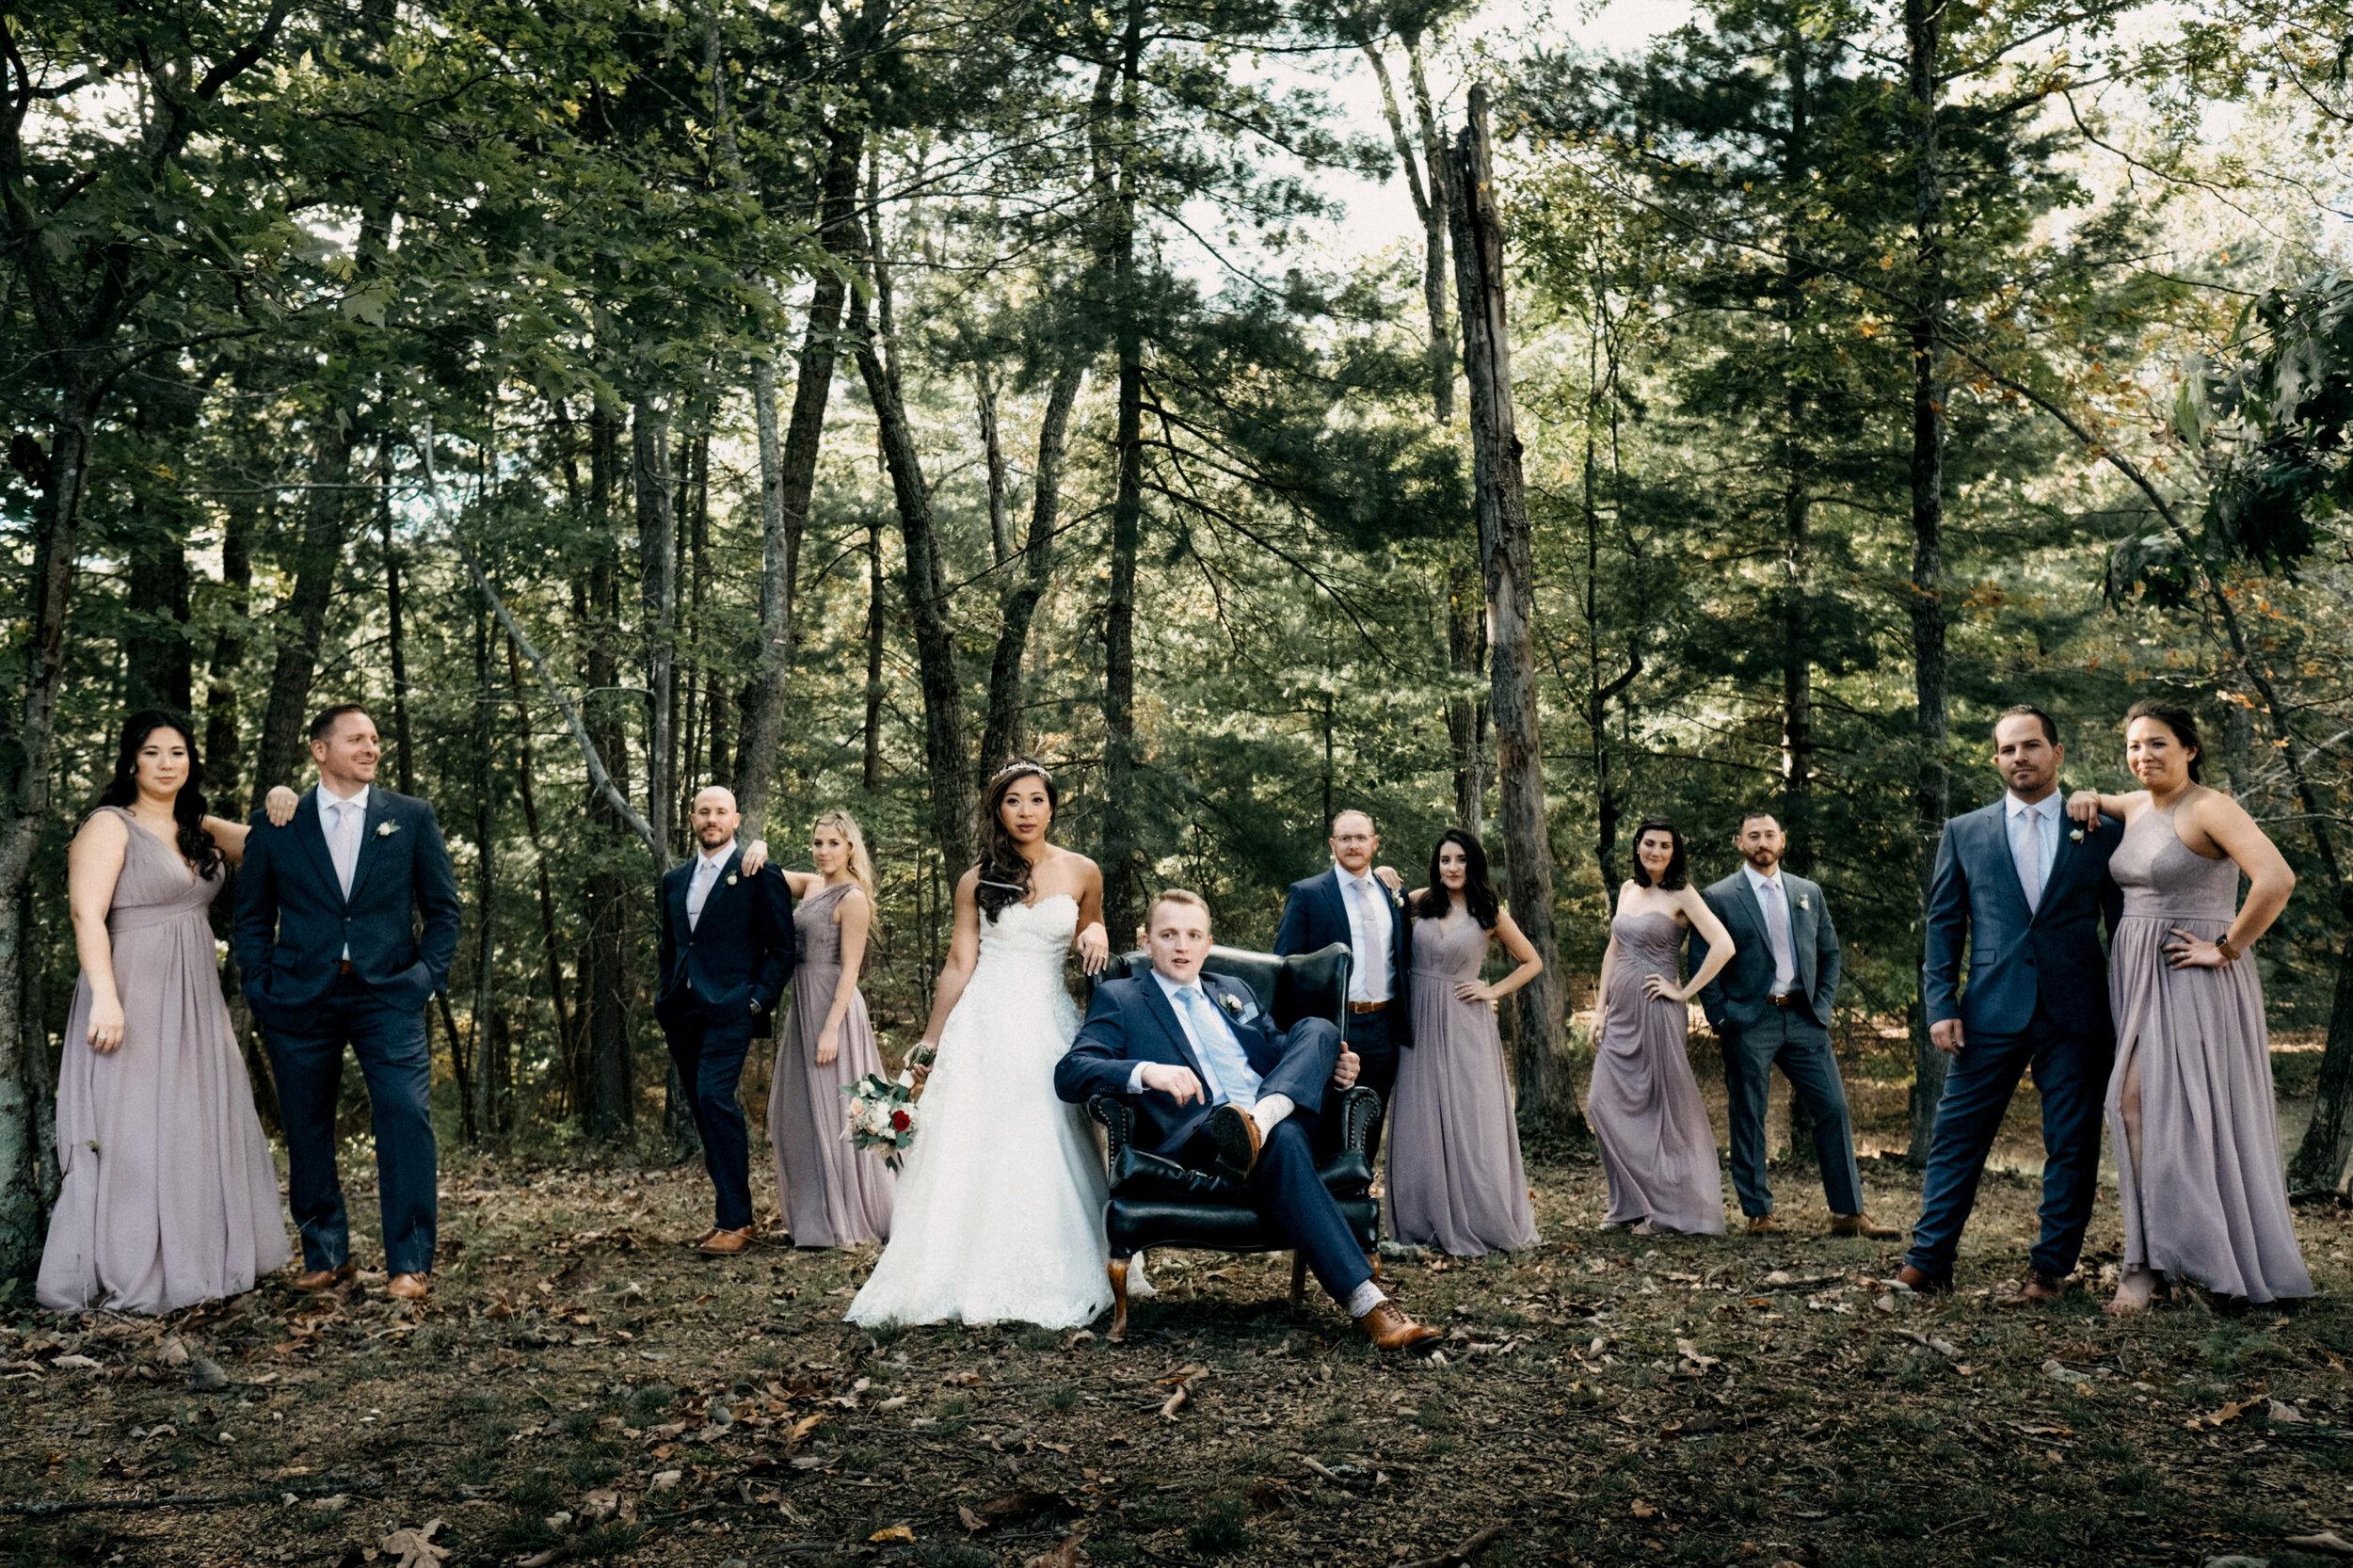 Christine + Danny Wedding Party-64.jpg